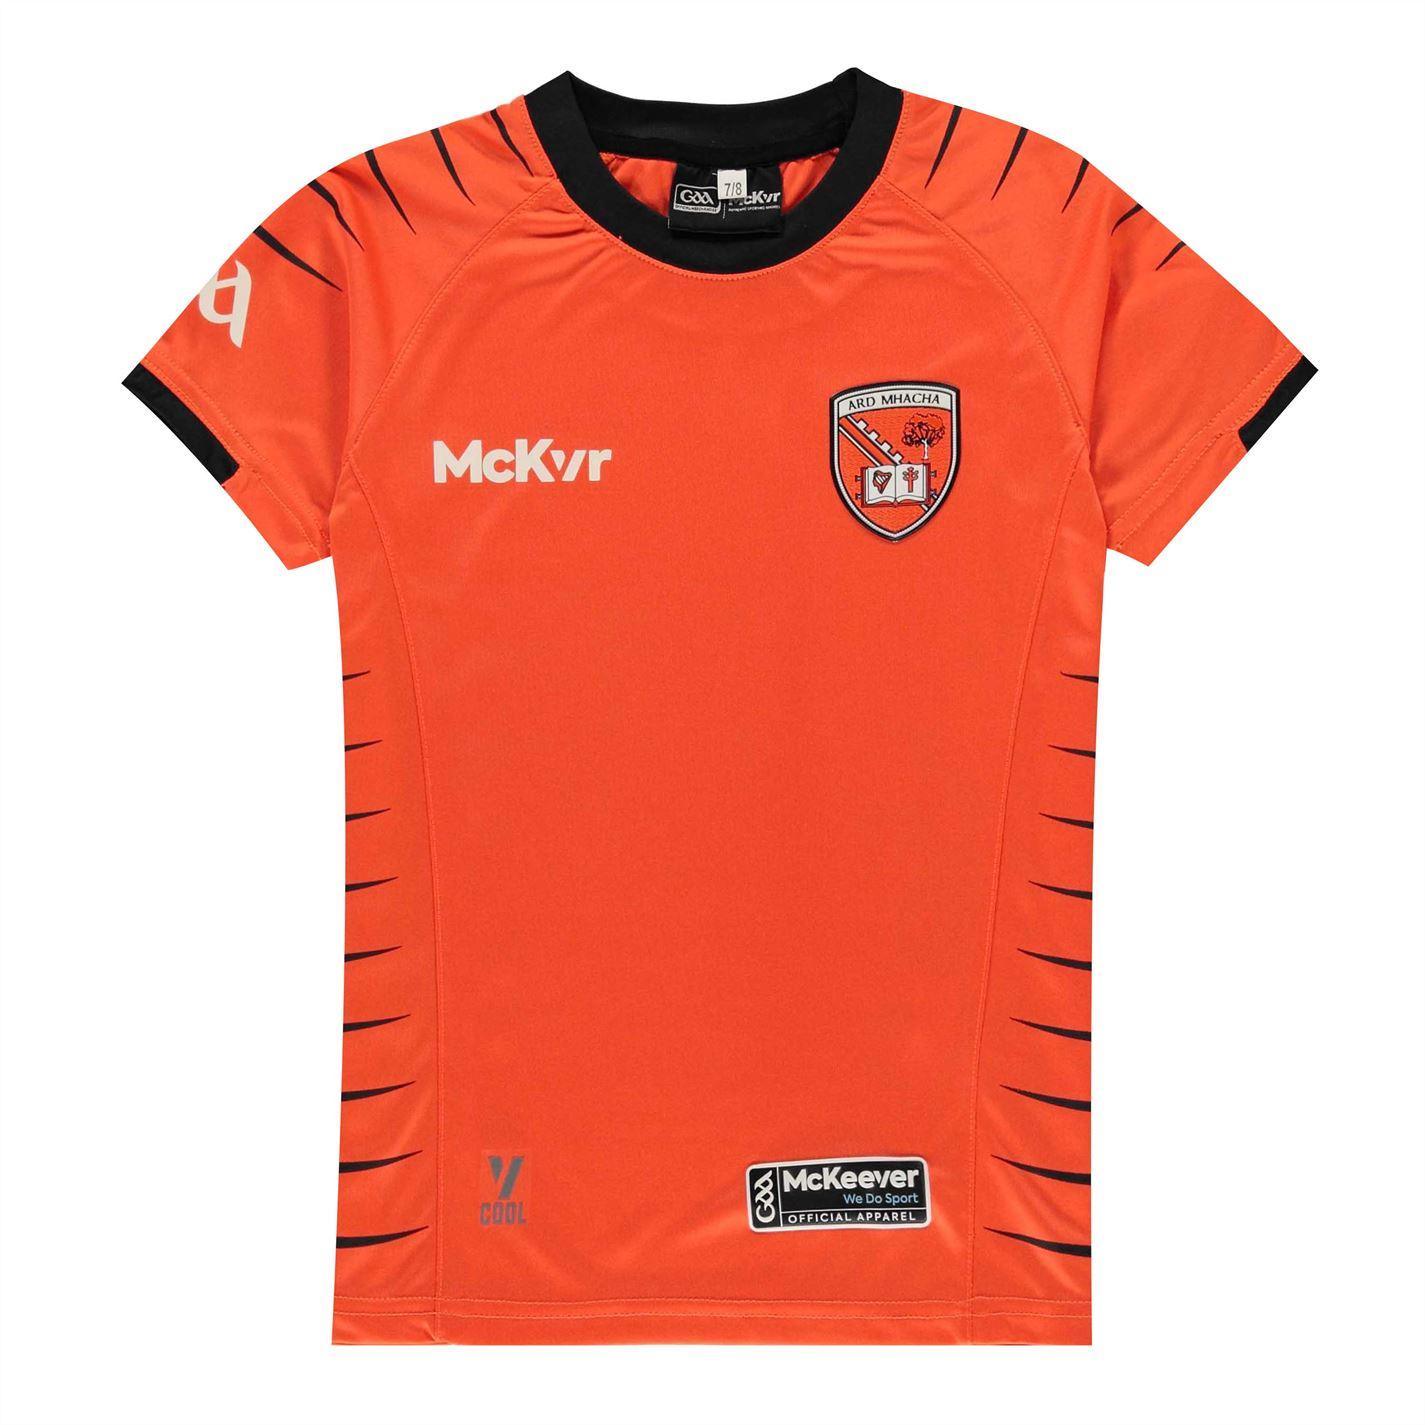 Mergi la Tricou Mc Keever Keever Armagh pentru copii portocaliu